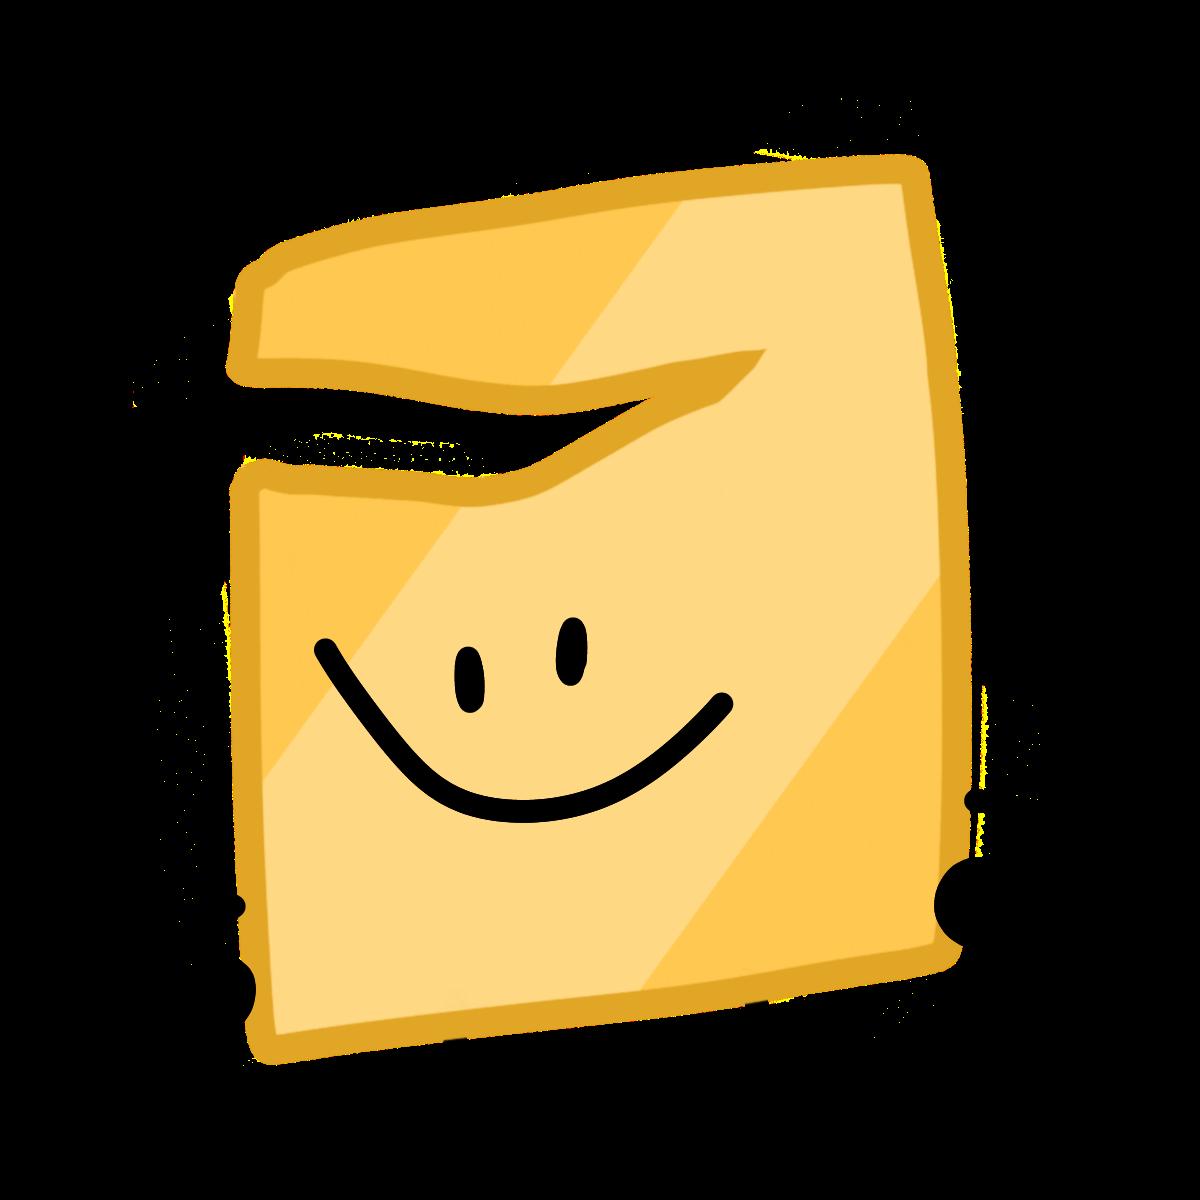 Cheese tear (Object Object)